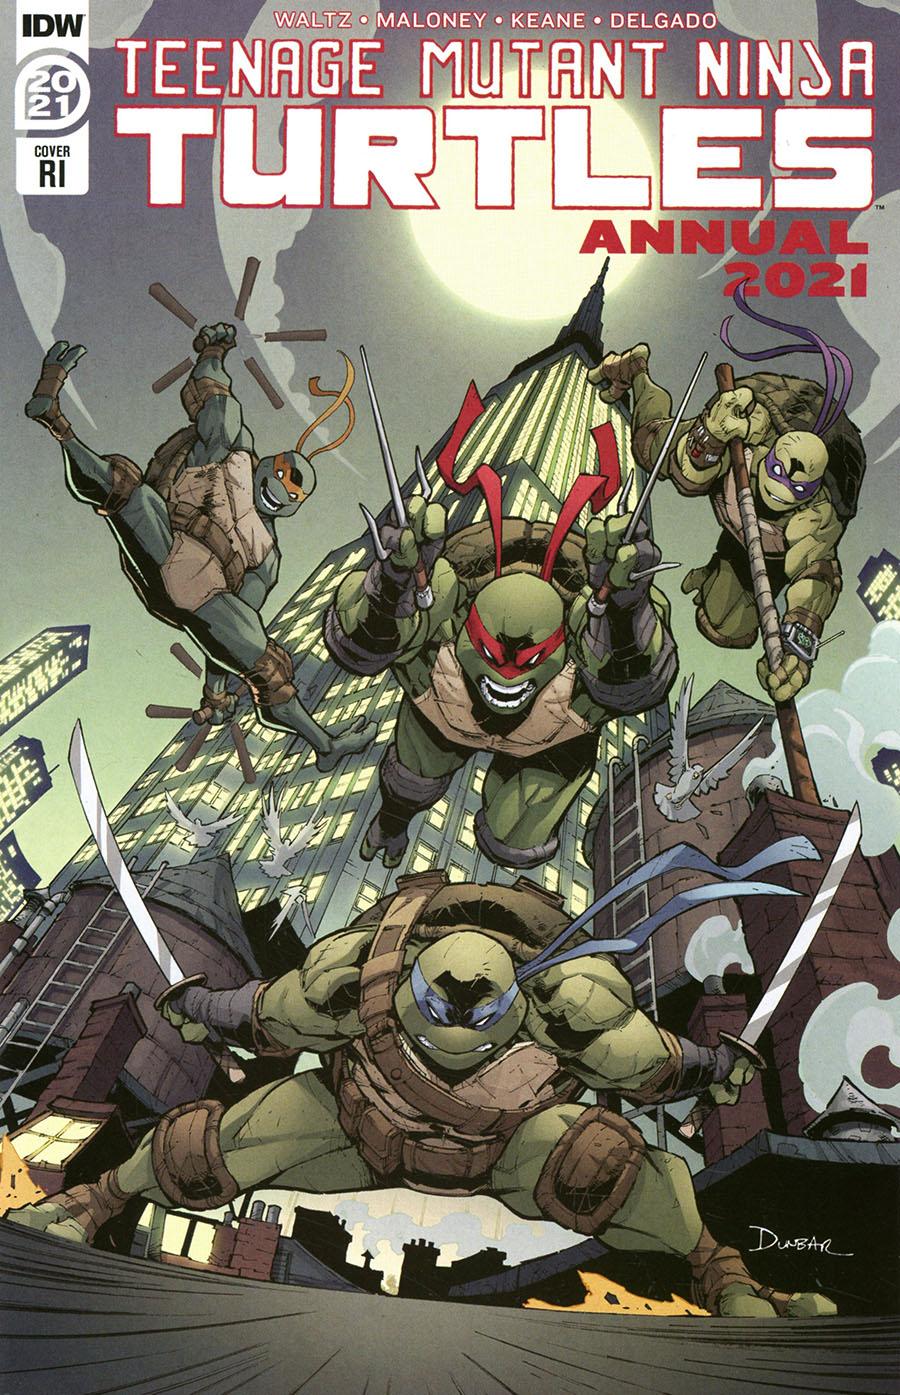 Teenage Mutant Ninja Turtles Vol 5 Annual 2021 Cover C Incentive Max Dunbar Variant Cover